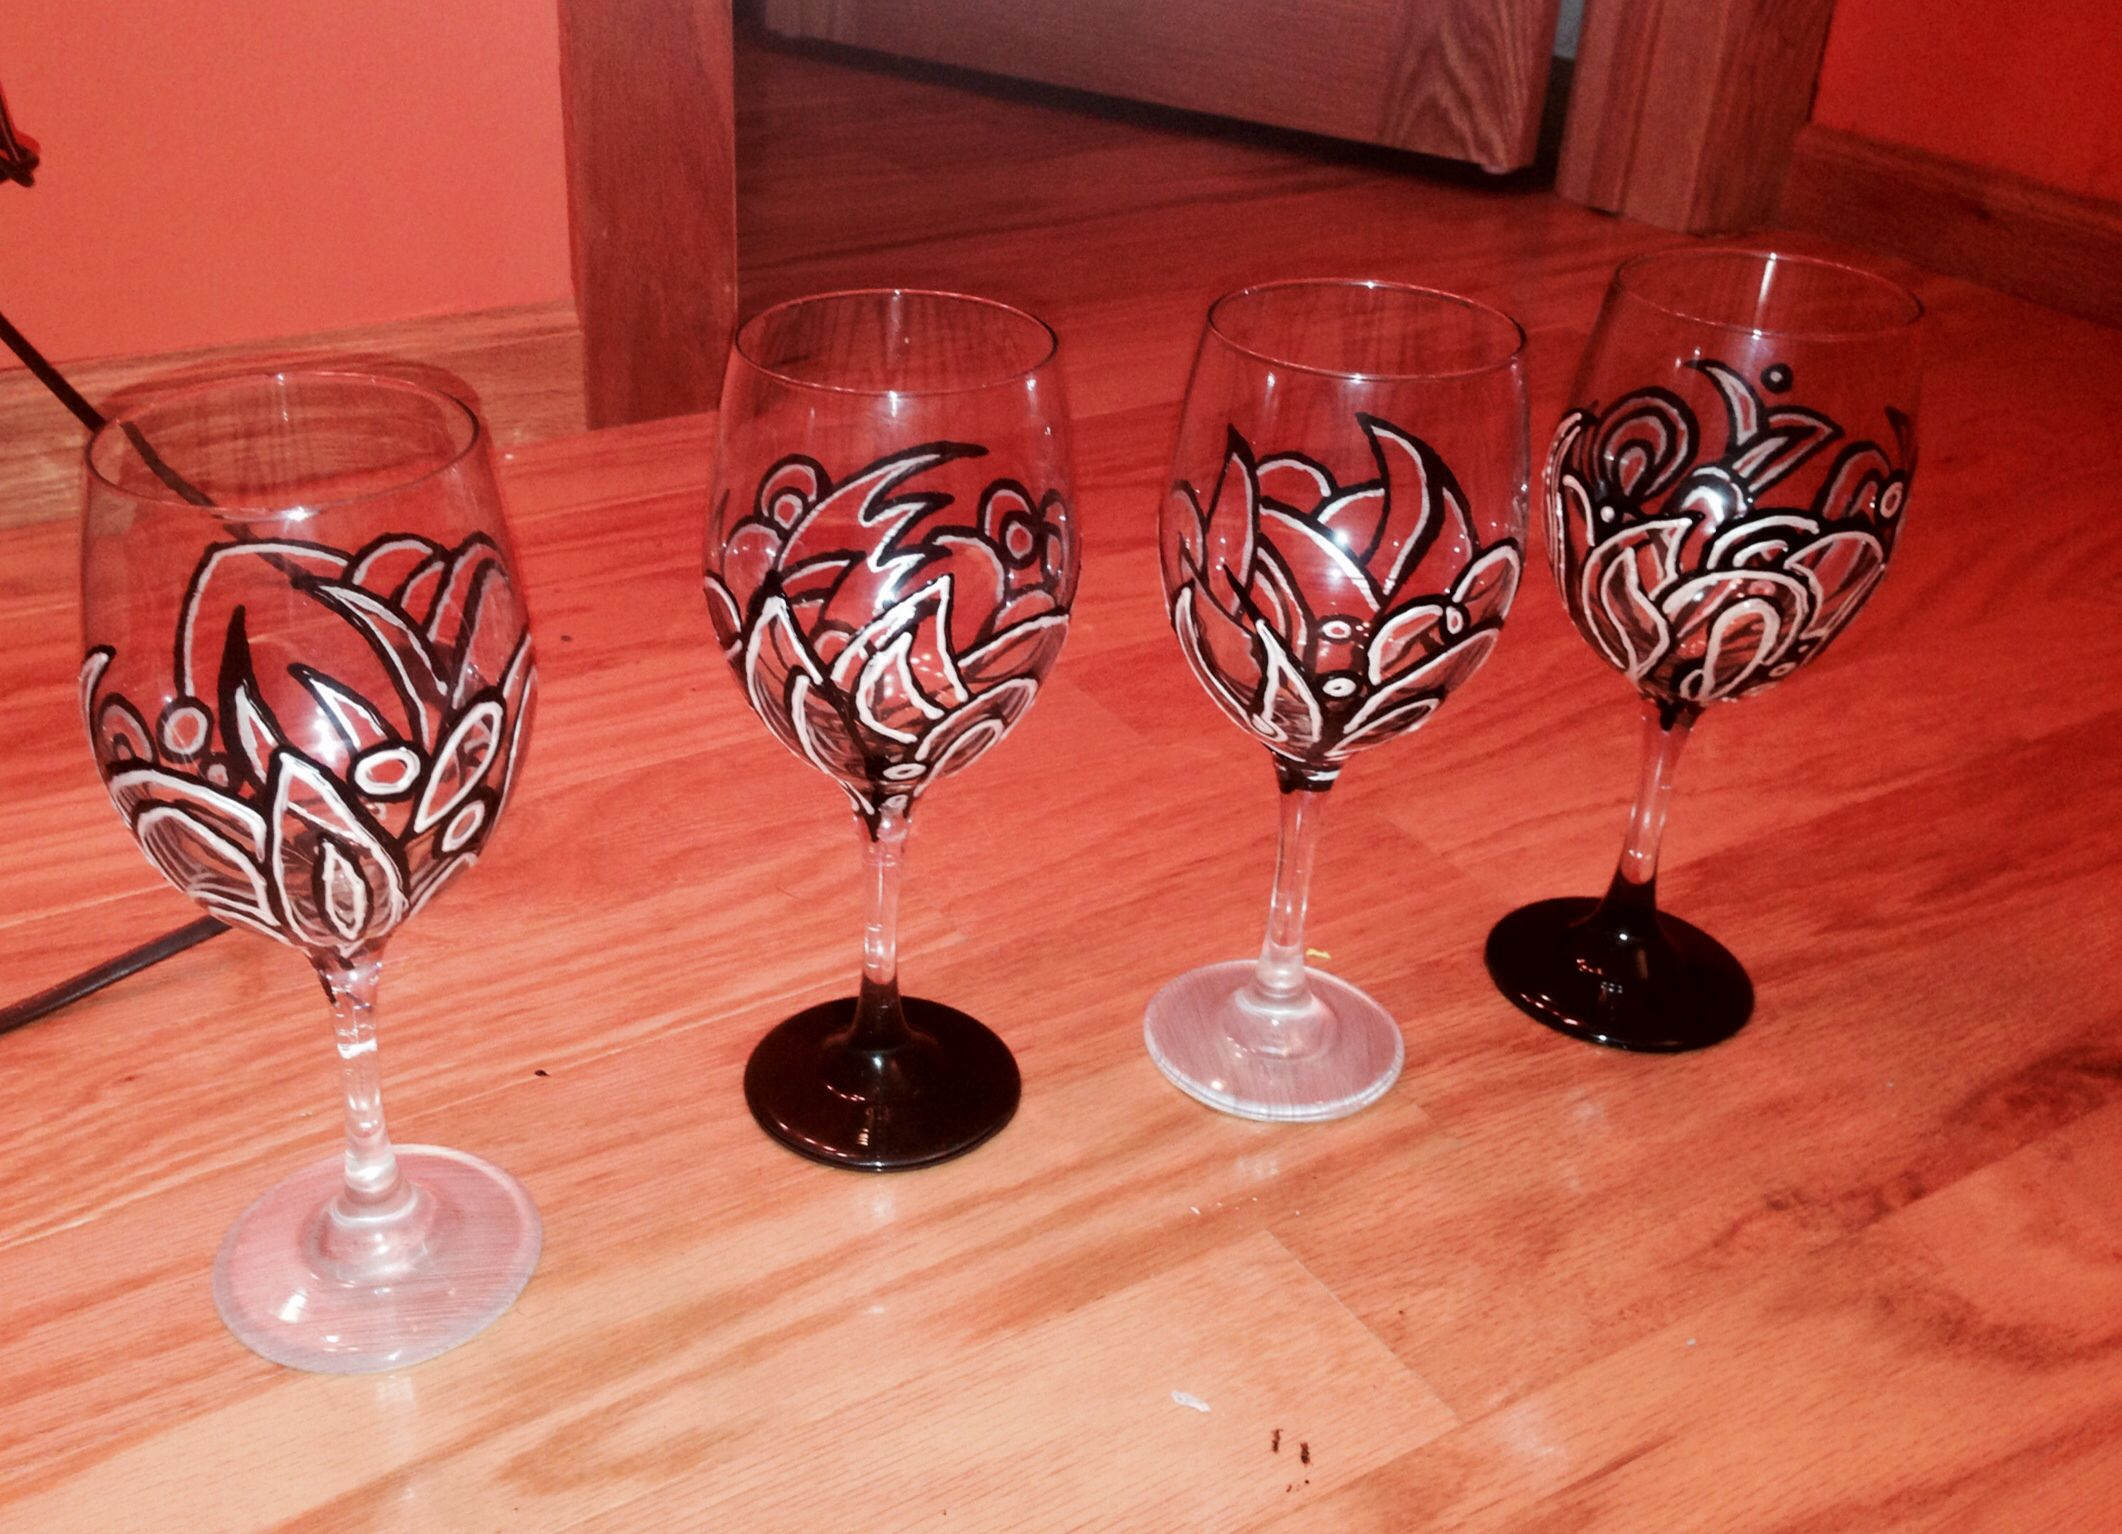 Diy Wine Glasses Decoration Painting Design Www Sararodgersartwork Weebly Com Painted Wine Glasses Designs Hand Painted Wine Glasses Painting Glassware